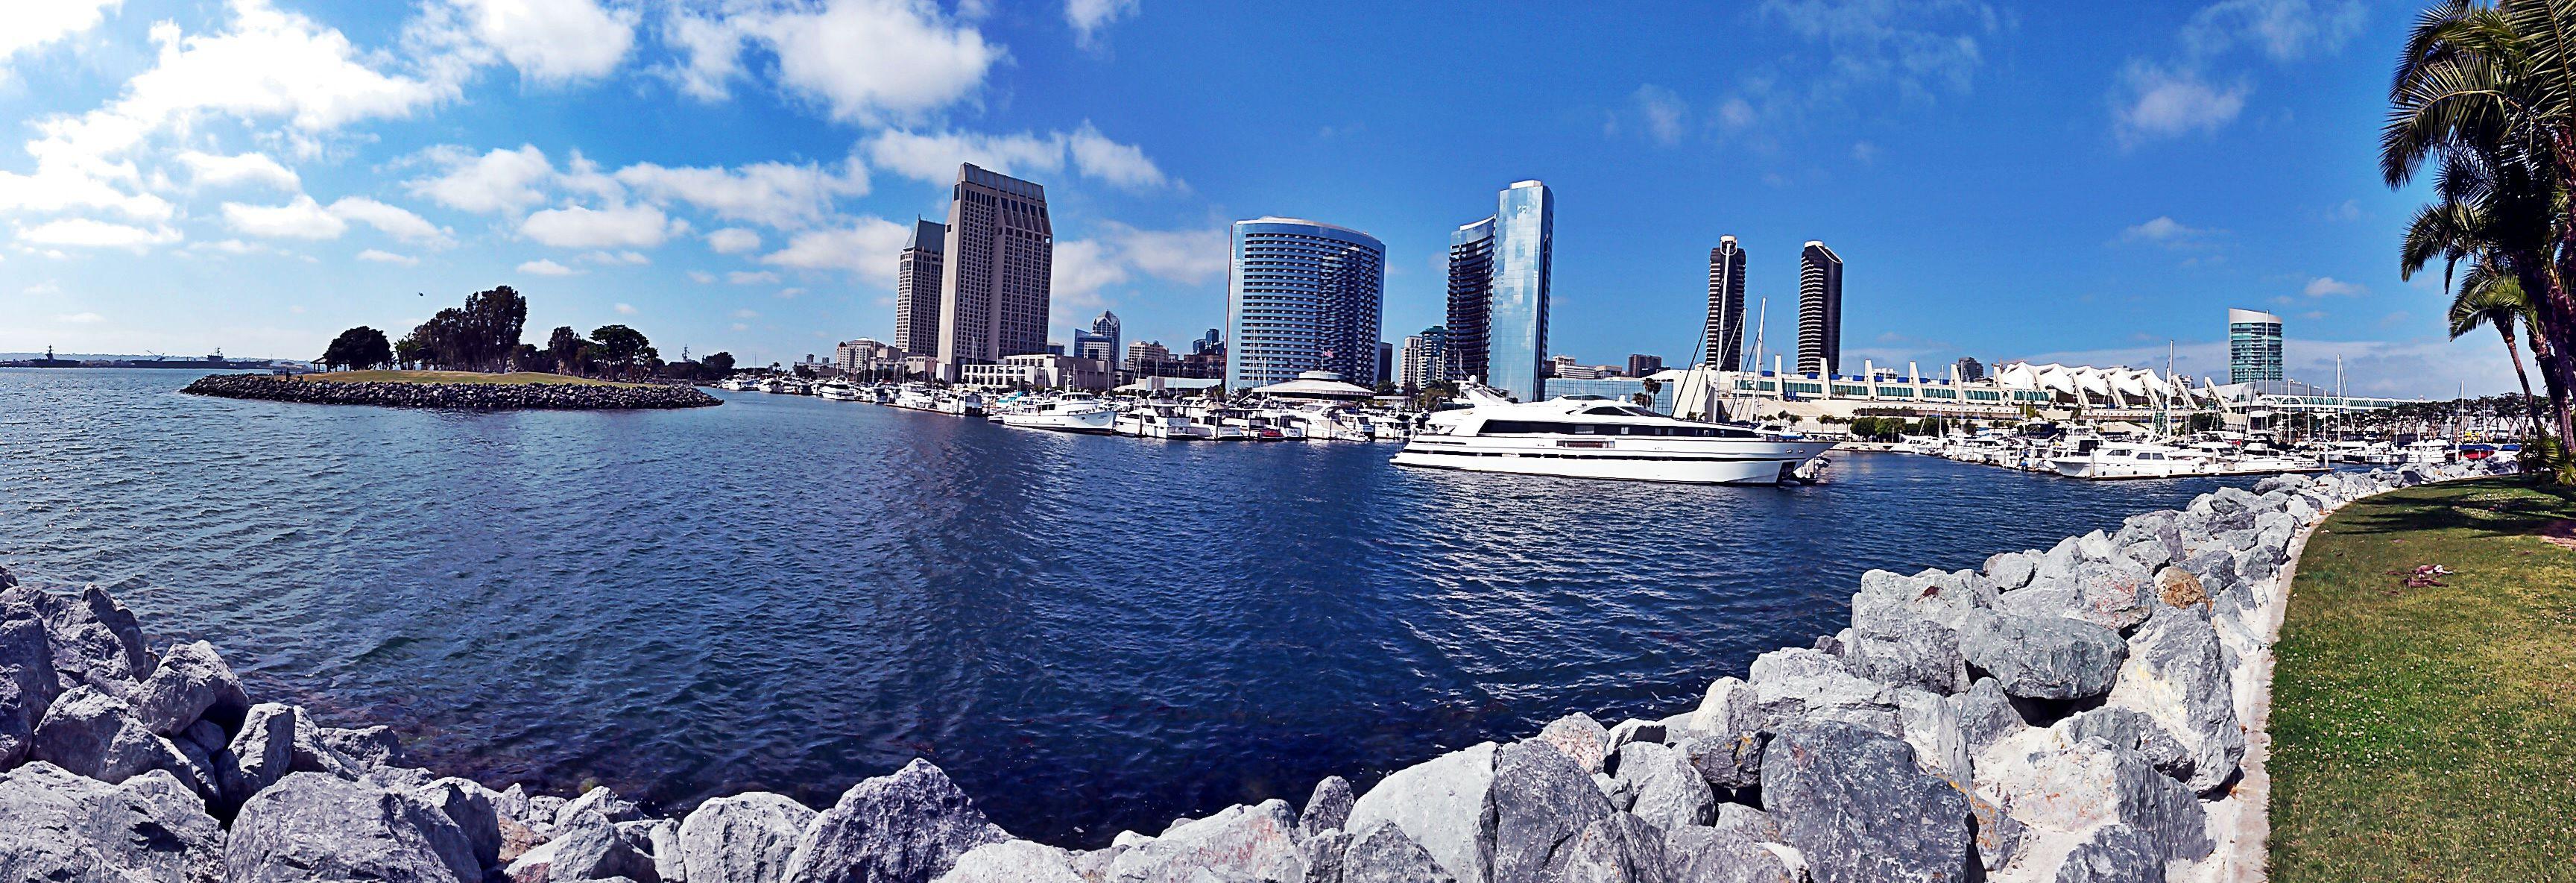 Embarcadero Downtown San Diego